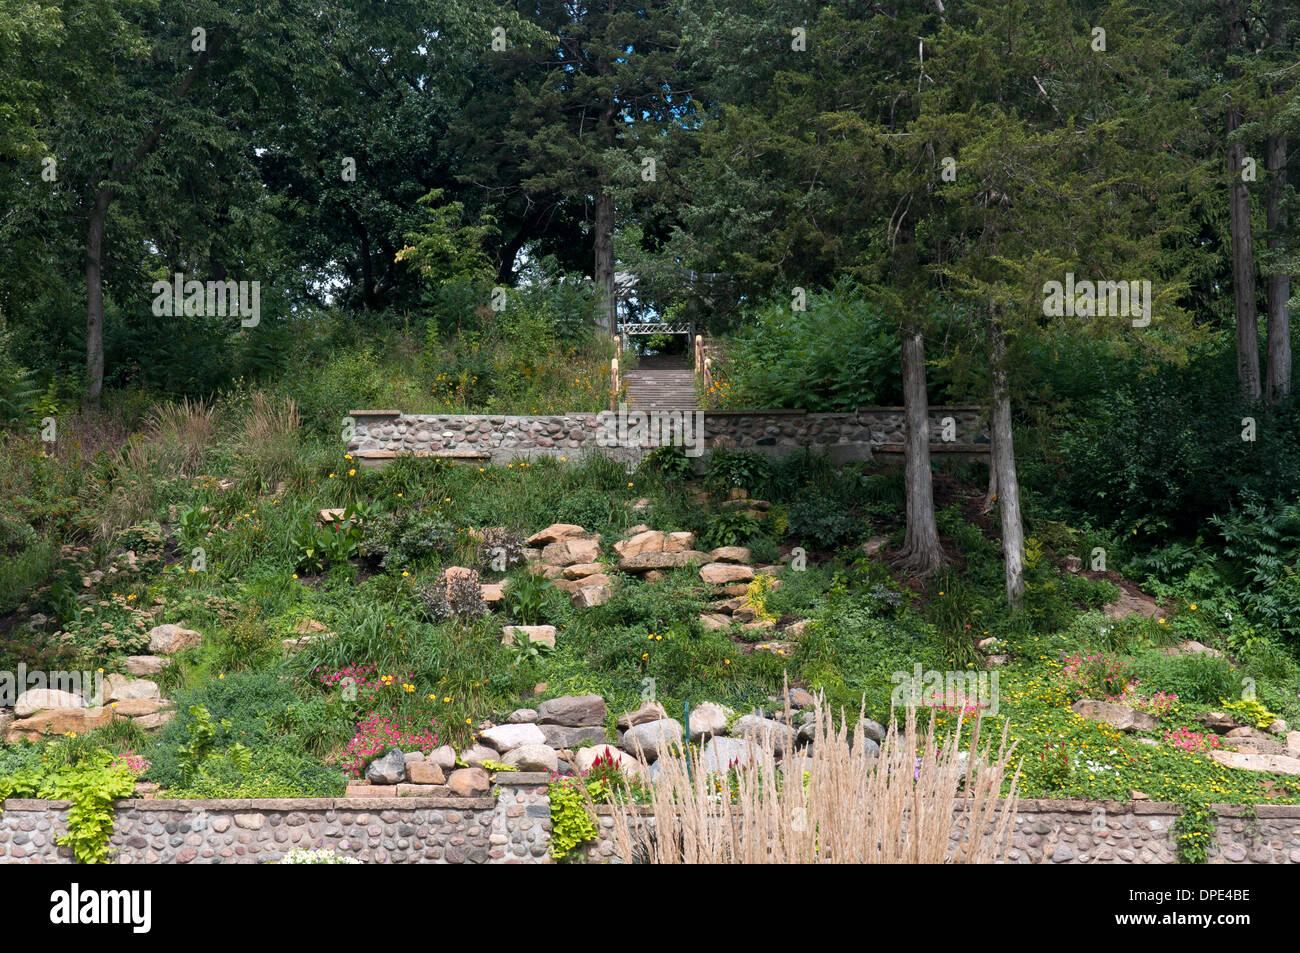 Sibley Park Rock Garden And Walking Trail Leading To Pergola In Mankato  Minnesota